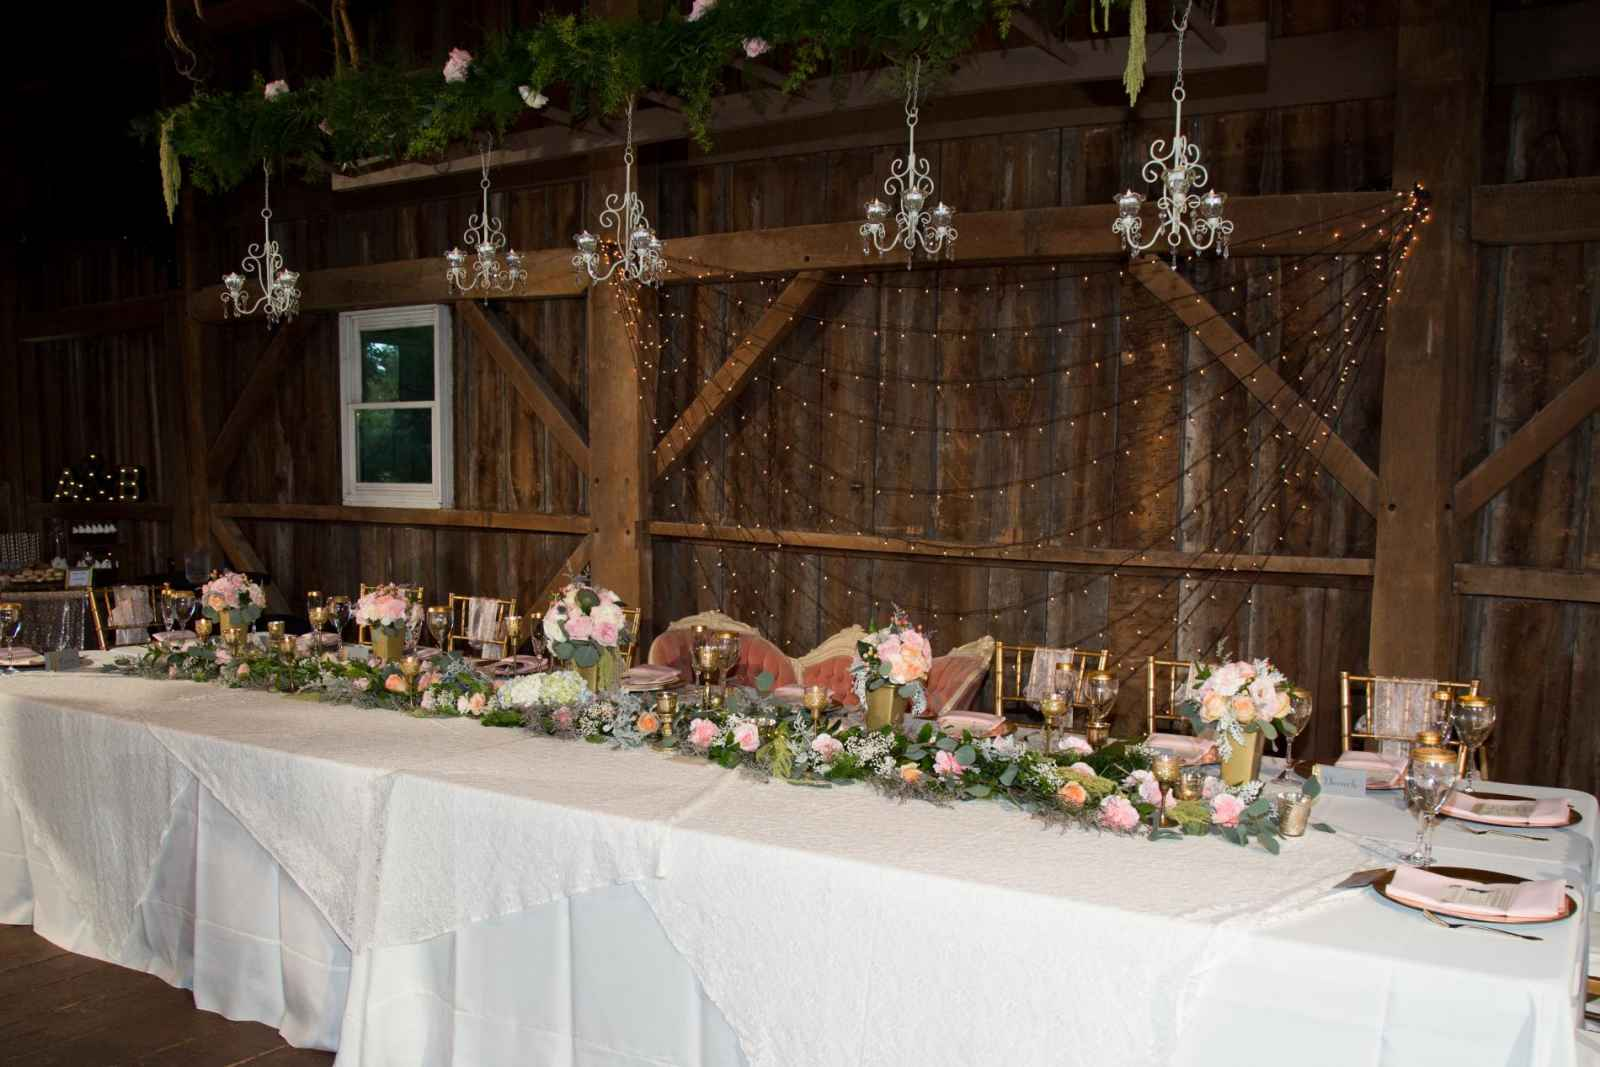 The Wedding Story of Ben Maupin and Ashley Underwood | WeddingDay ...